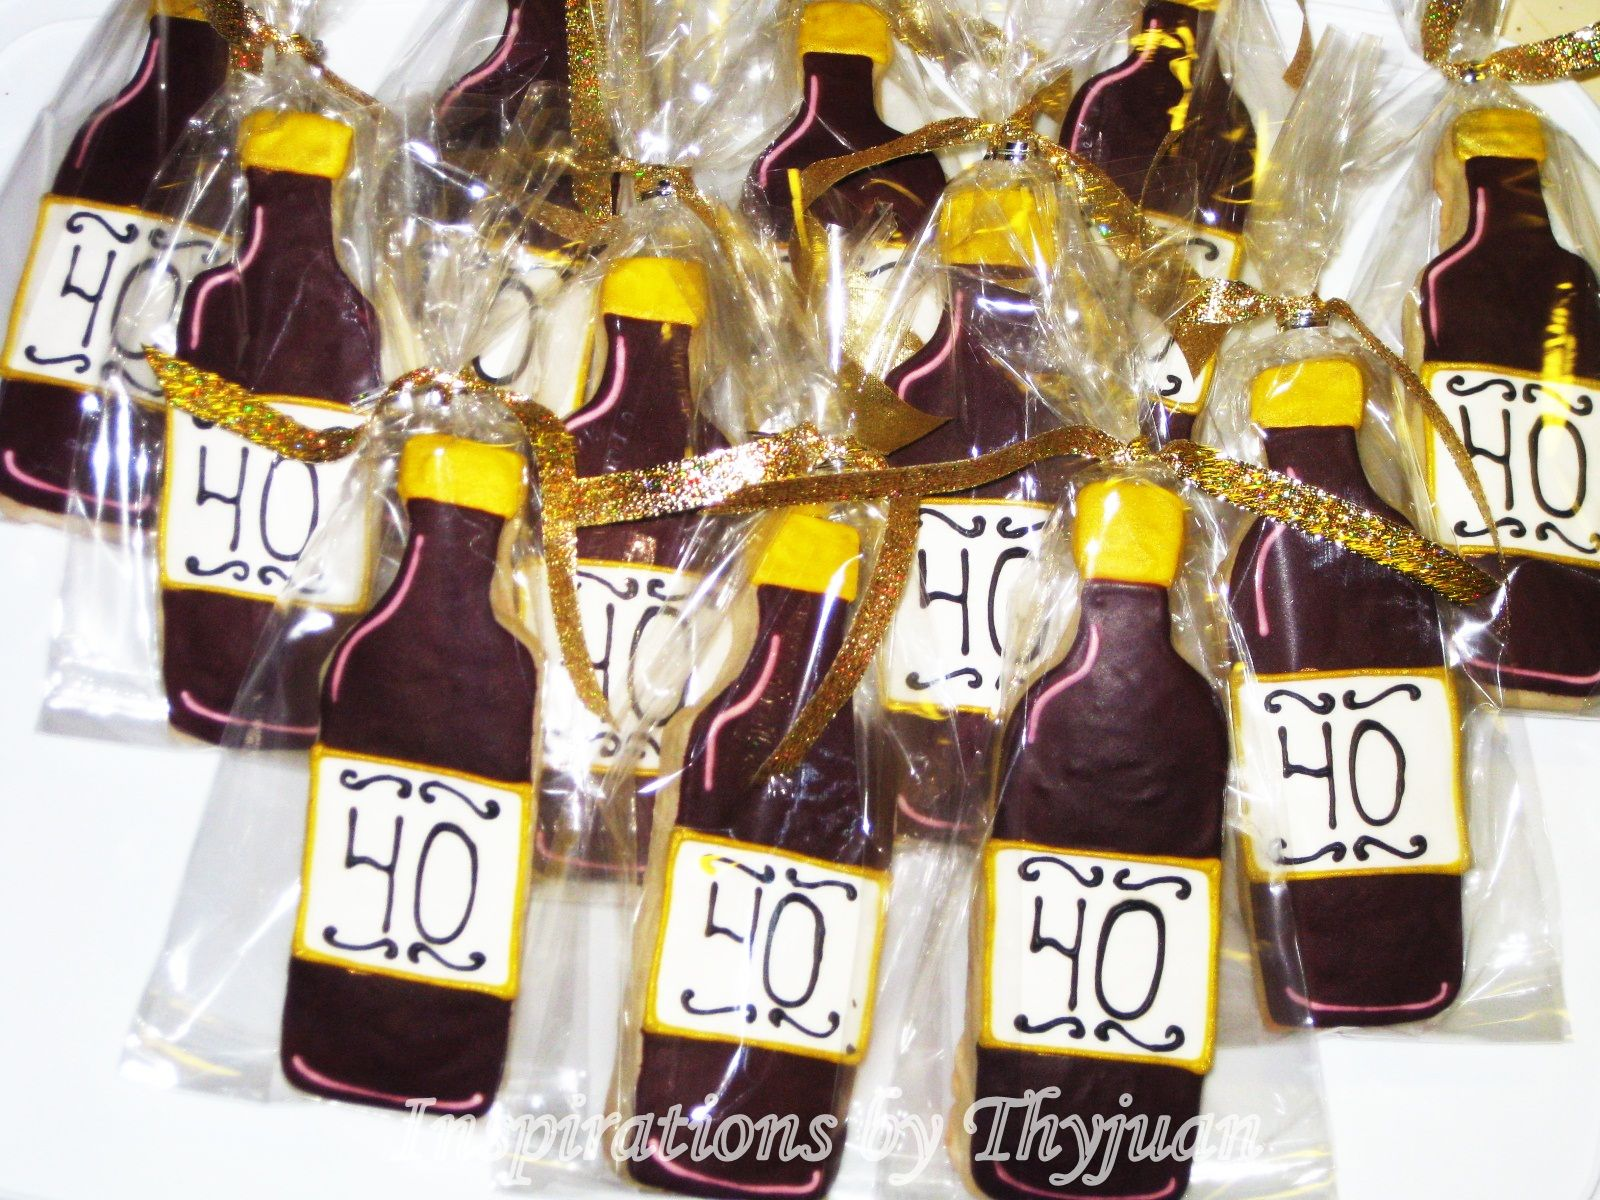 40 bday ideas 40 year old birthday gift ideas for a man